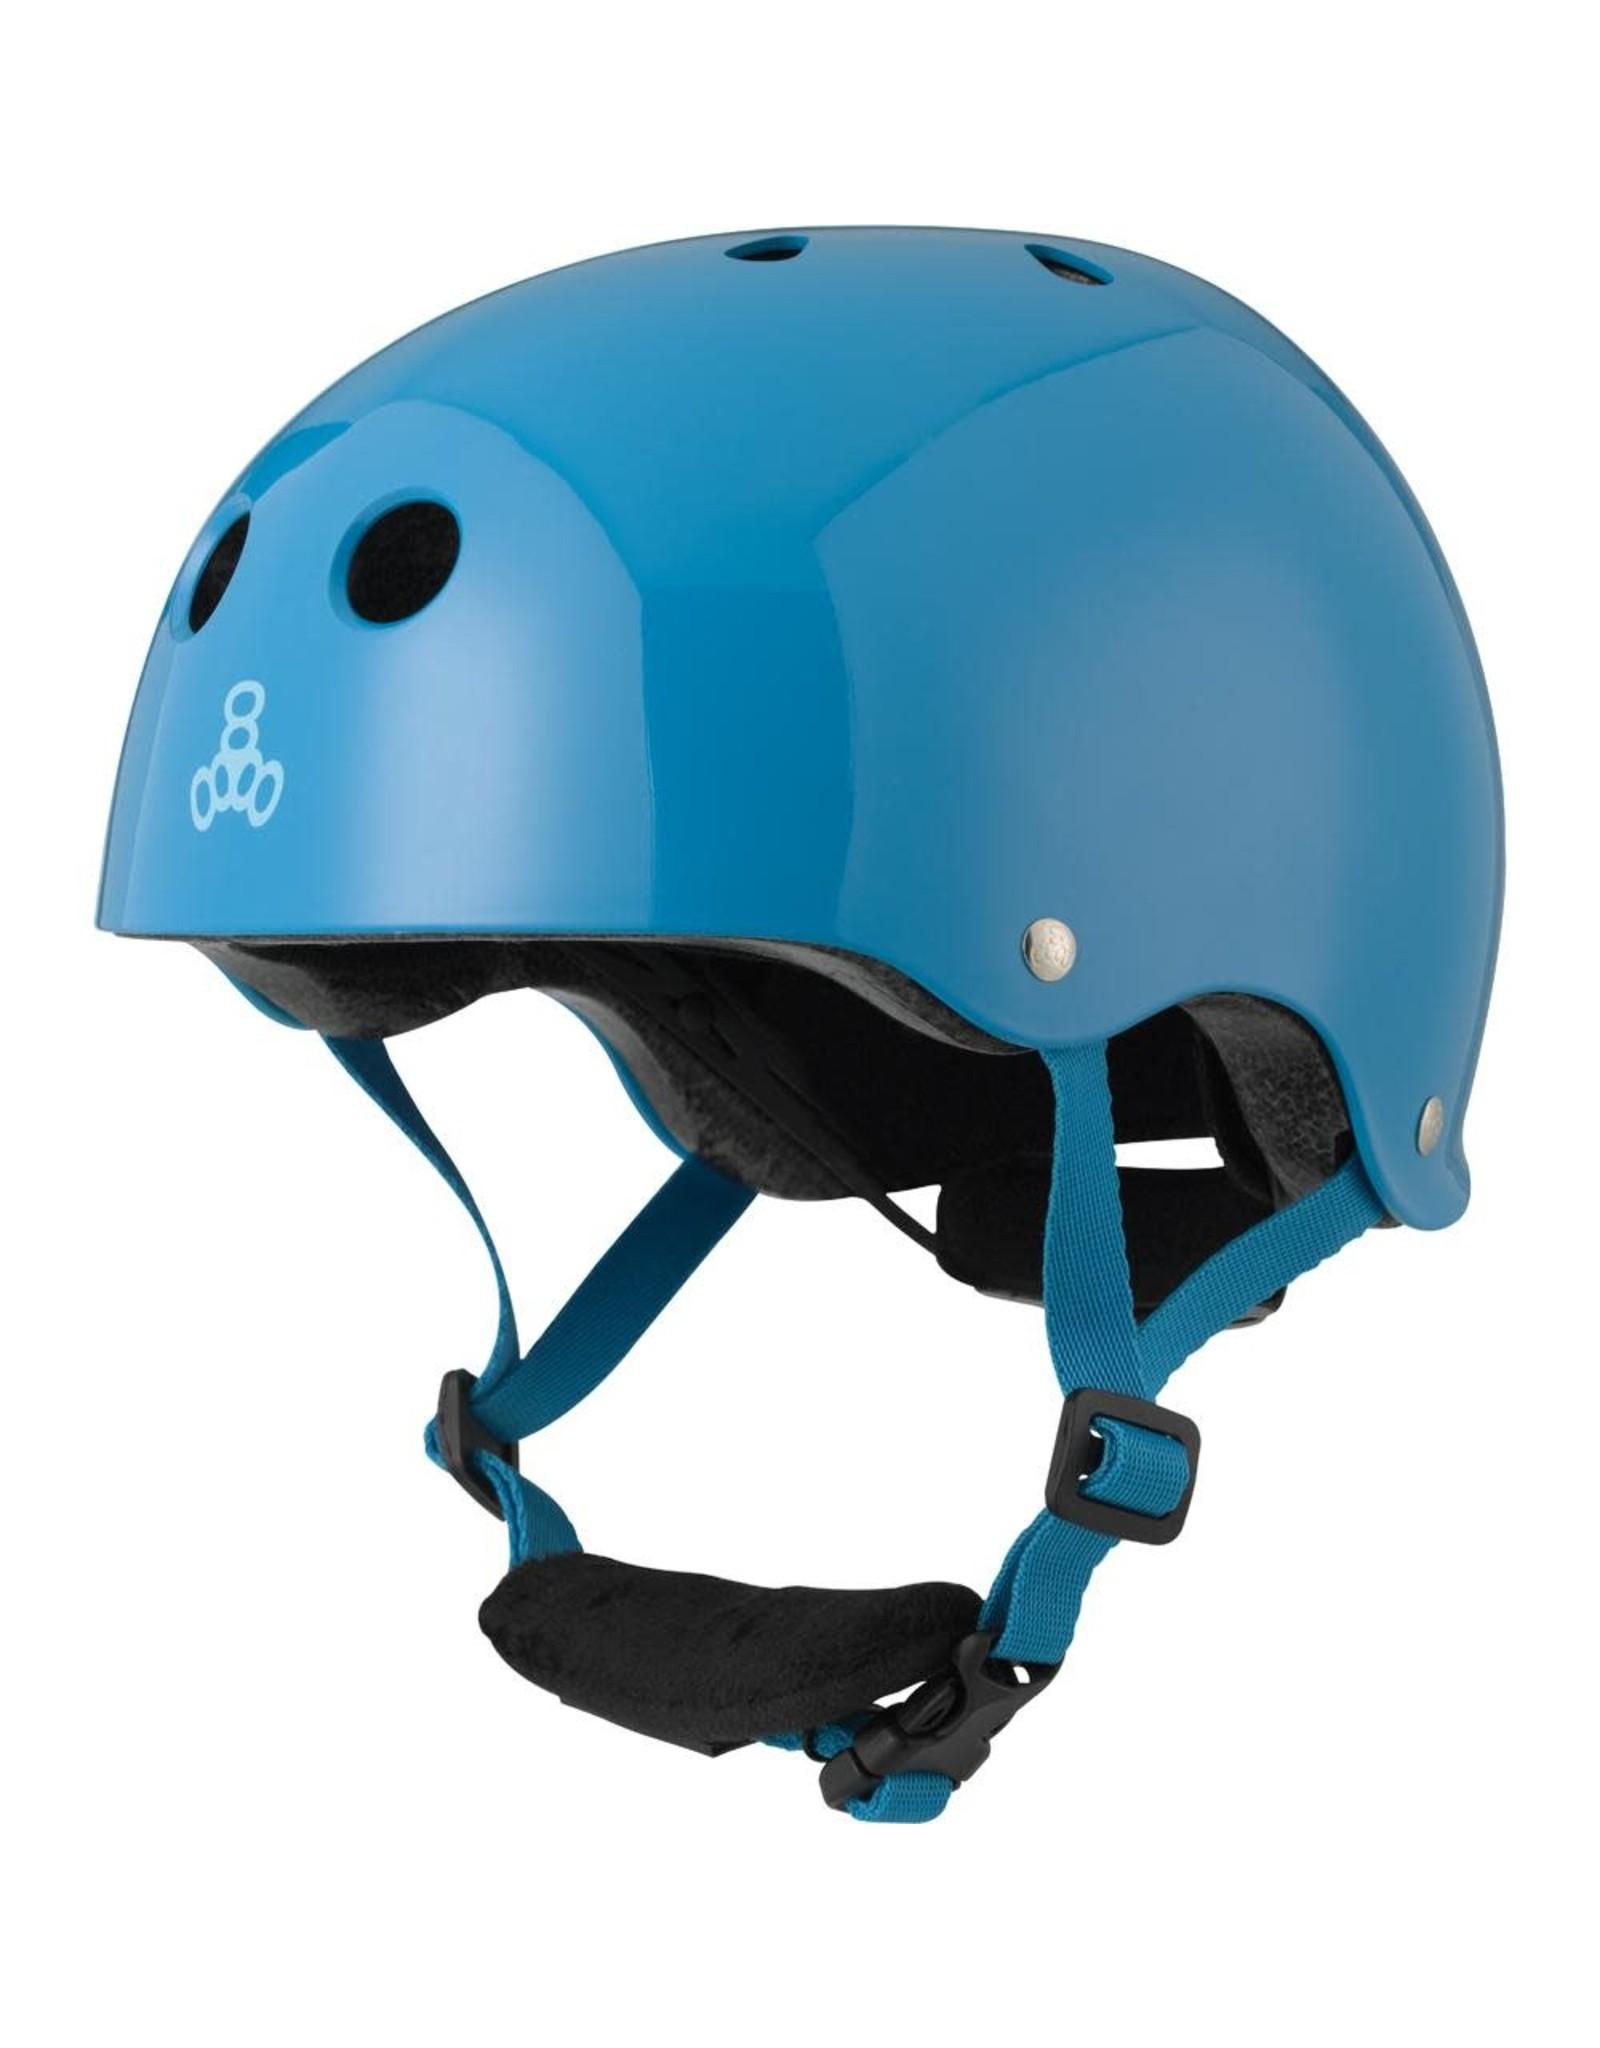 Triple 8 Lil 8 Youth Helmet